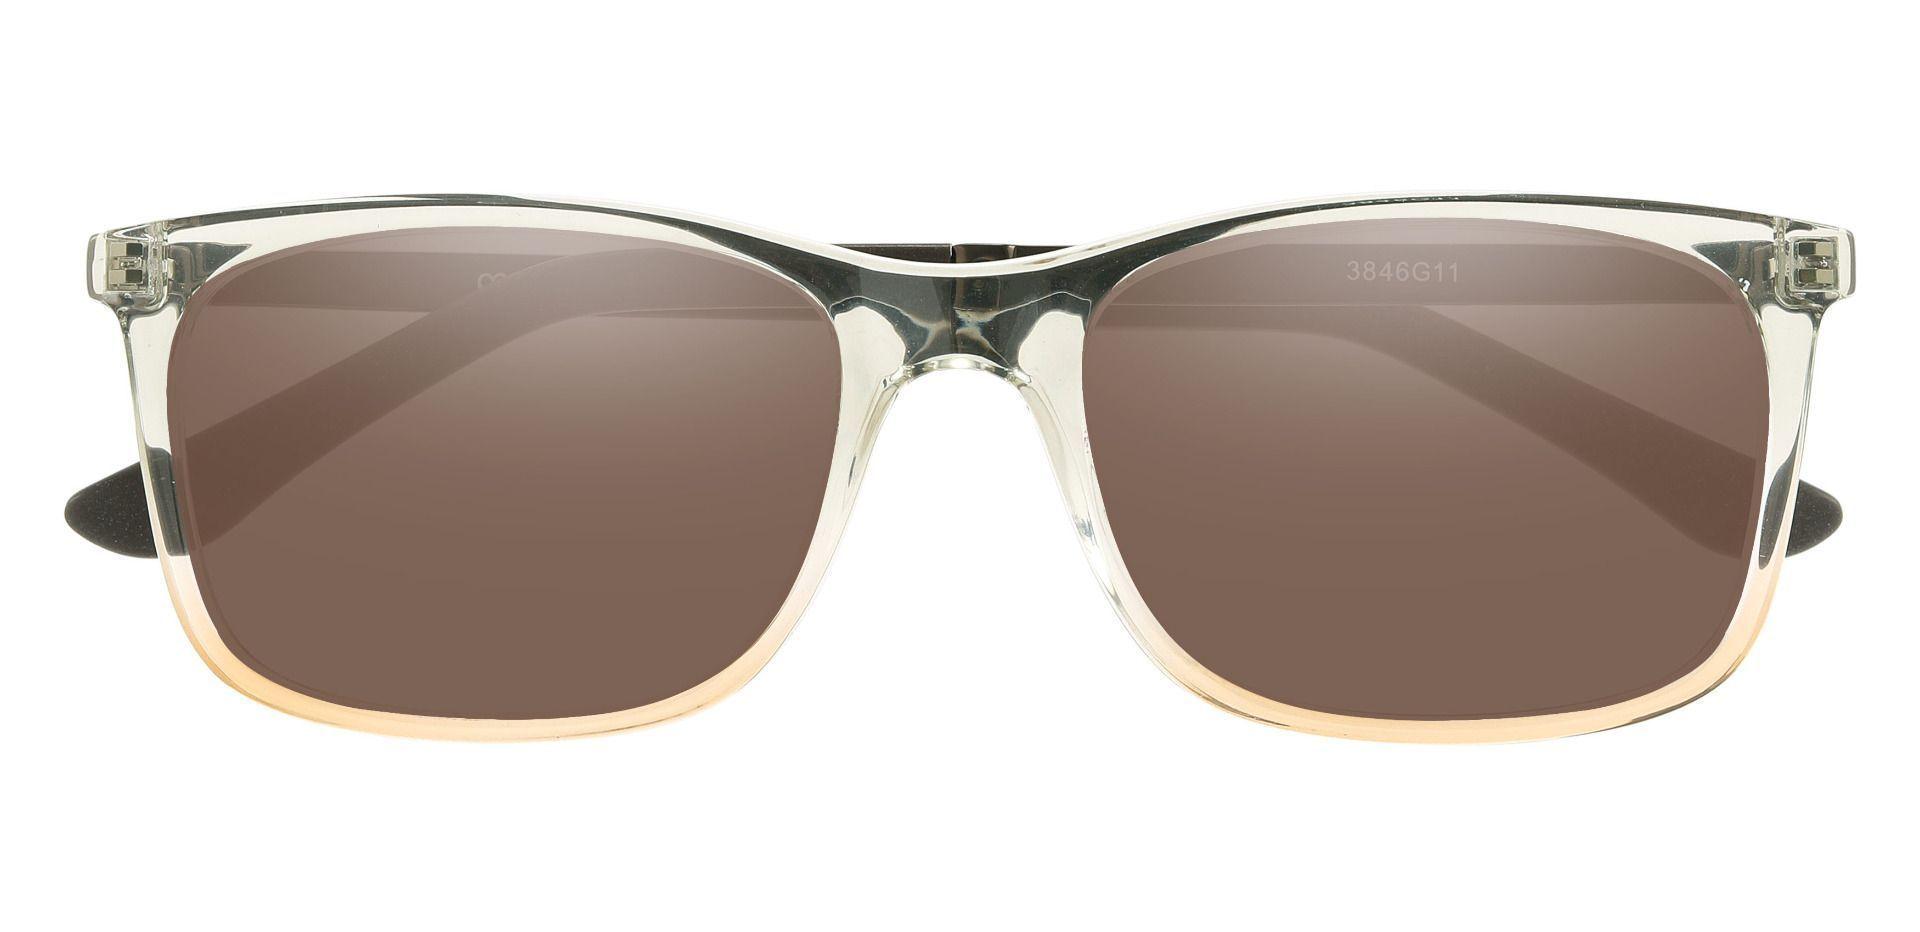 Kemper Rectangle Prescription Sunglasses - Gray Frame With Brown Lenses